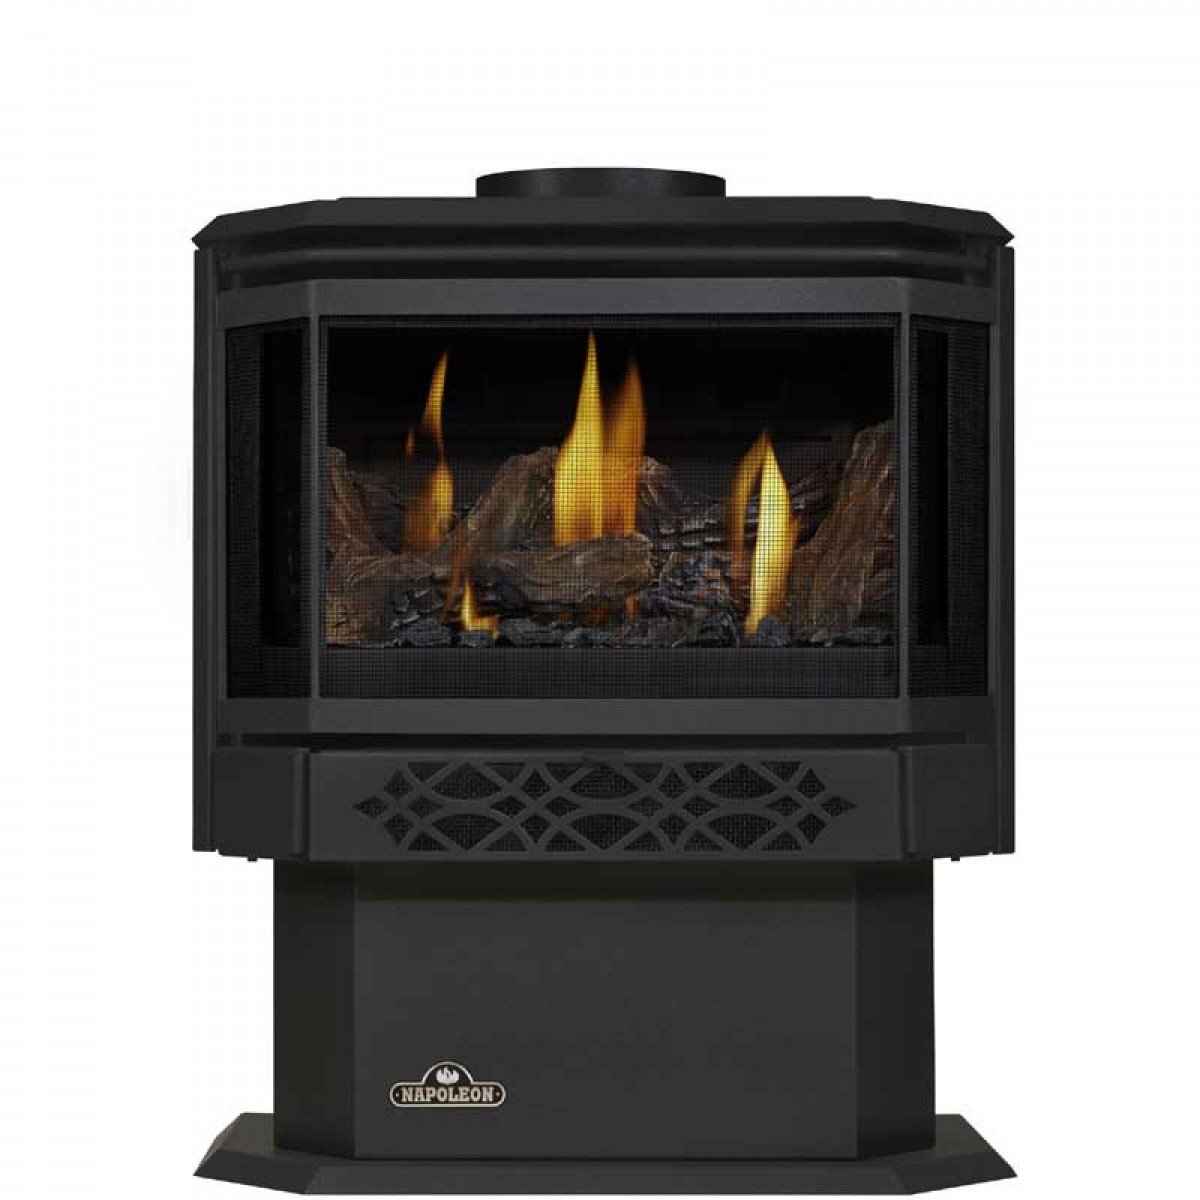 Napoleon gds28 1nsb haliburton dv pedestal natgas stove at for Fireplace options